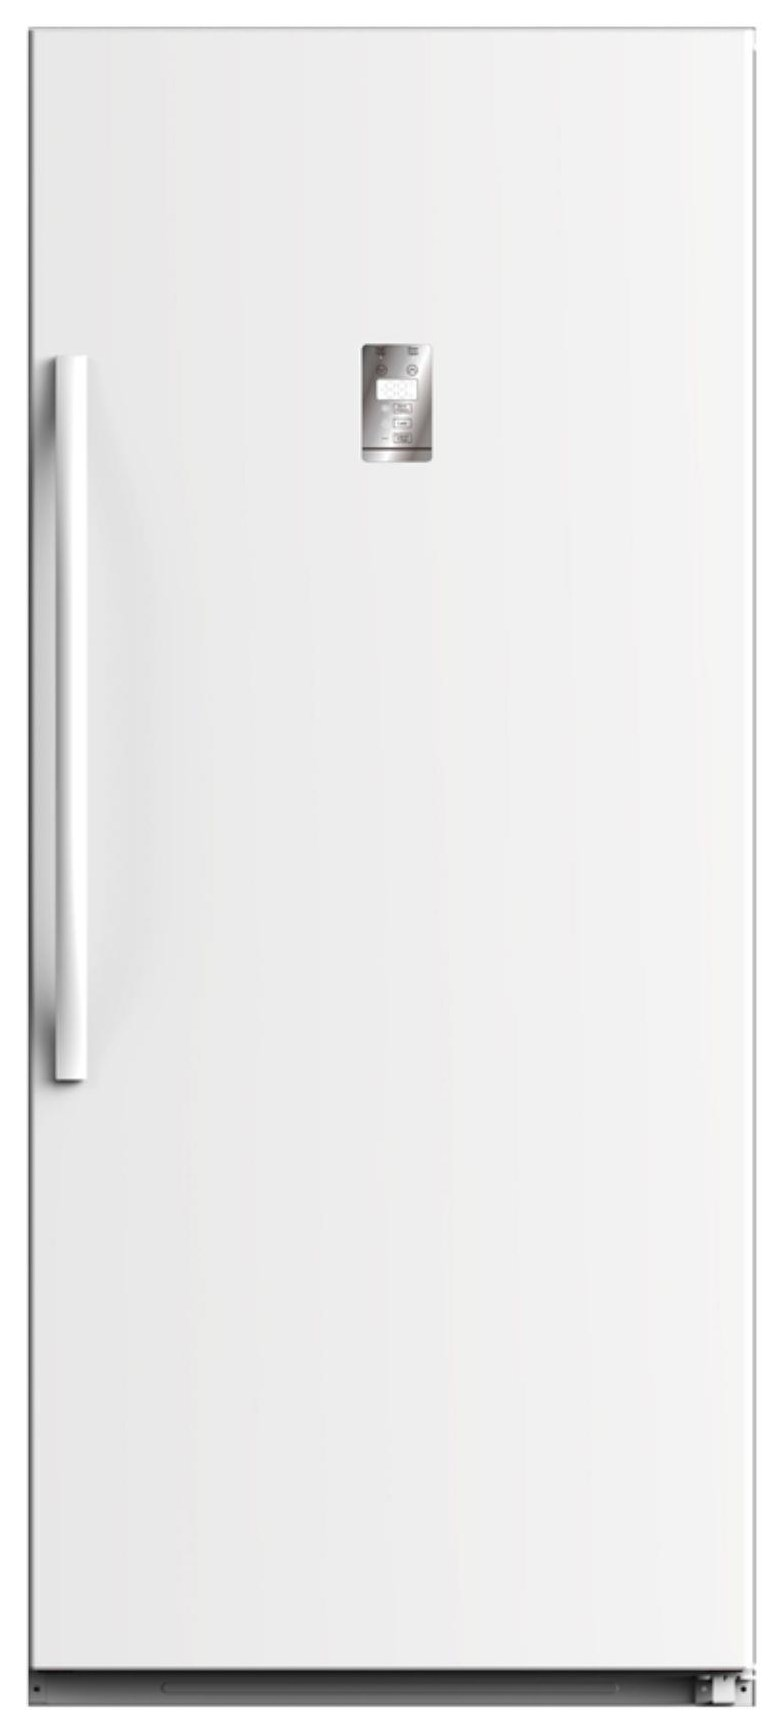 WHS-507FWEW1 14 cf Upright Freezer by Midea at Furniture Fair - North Carolina